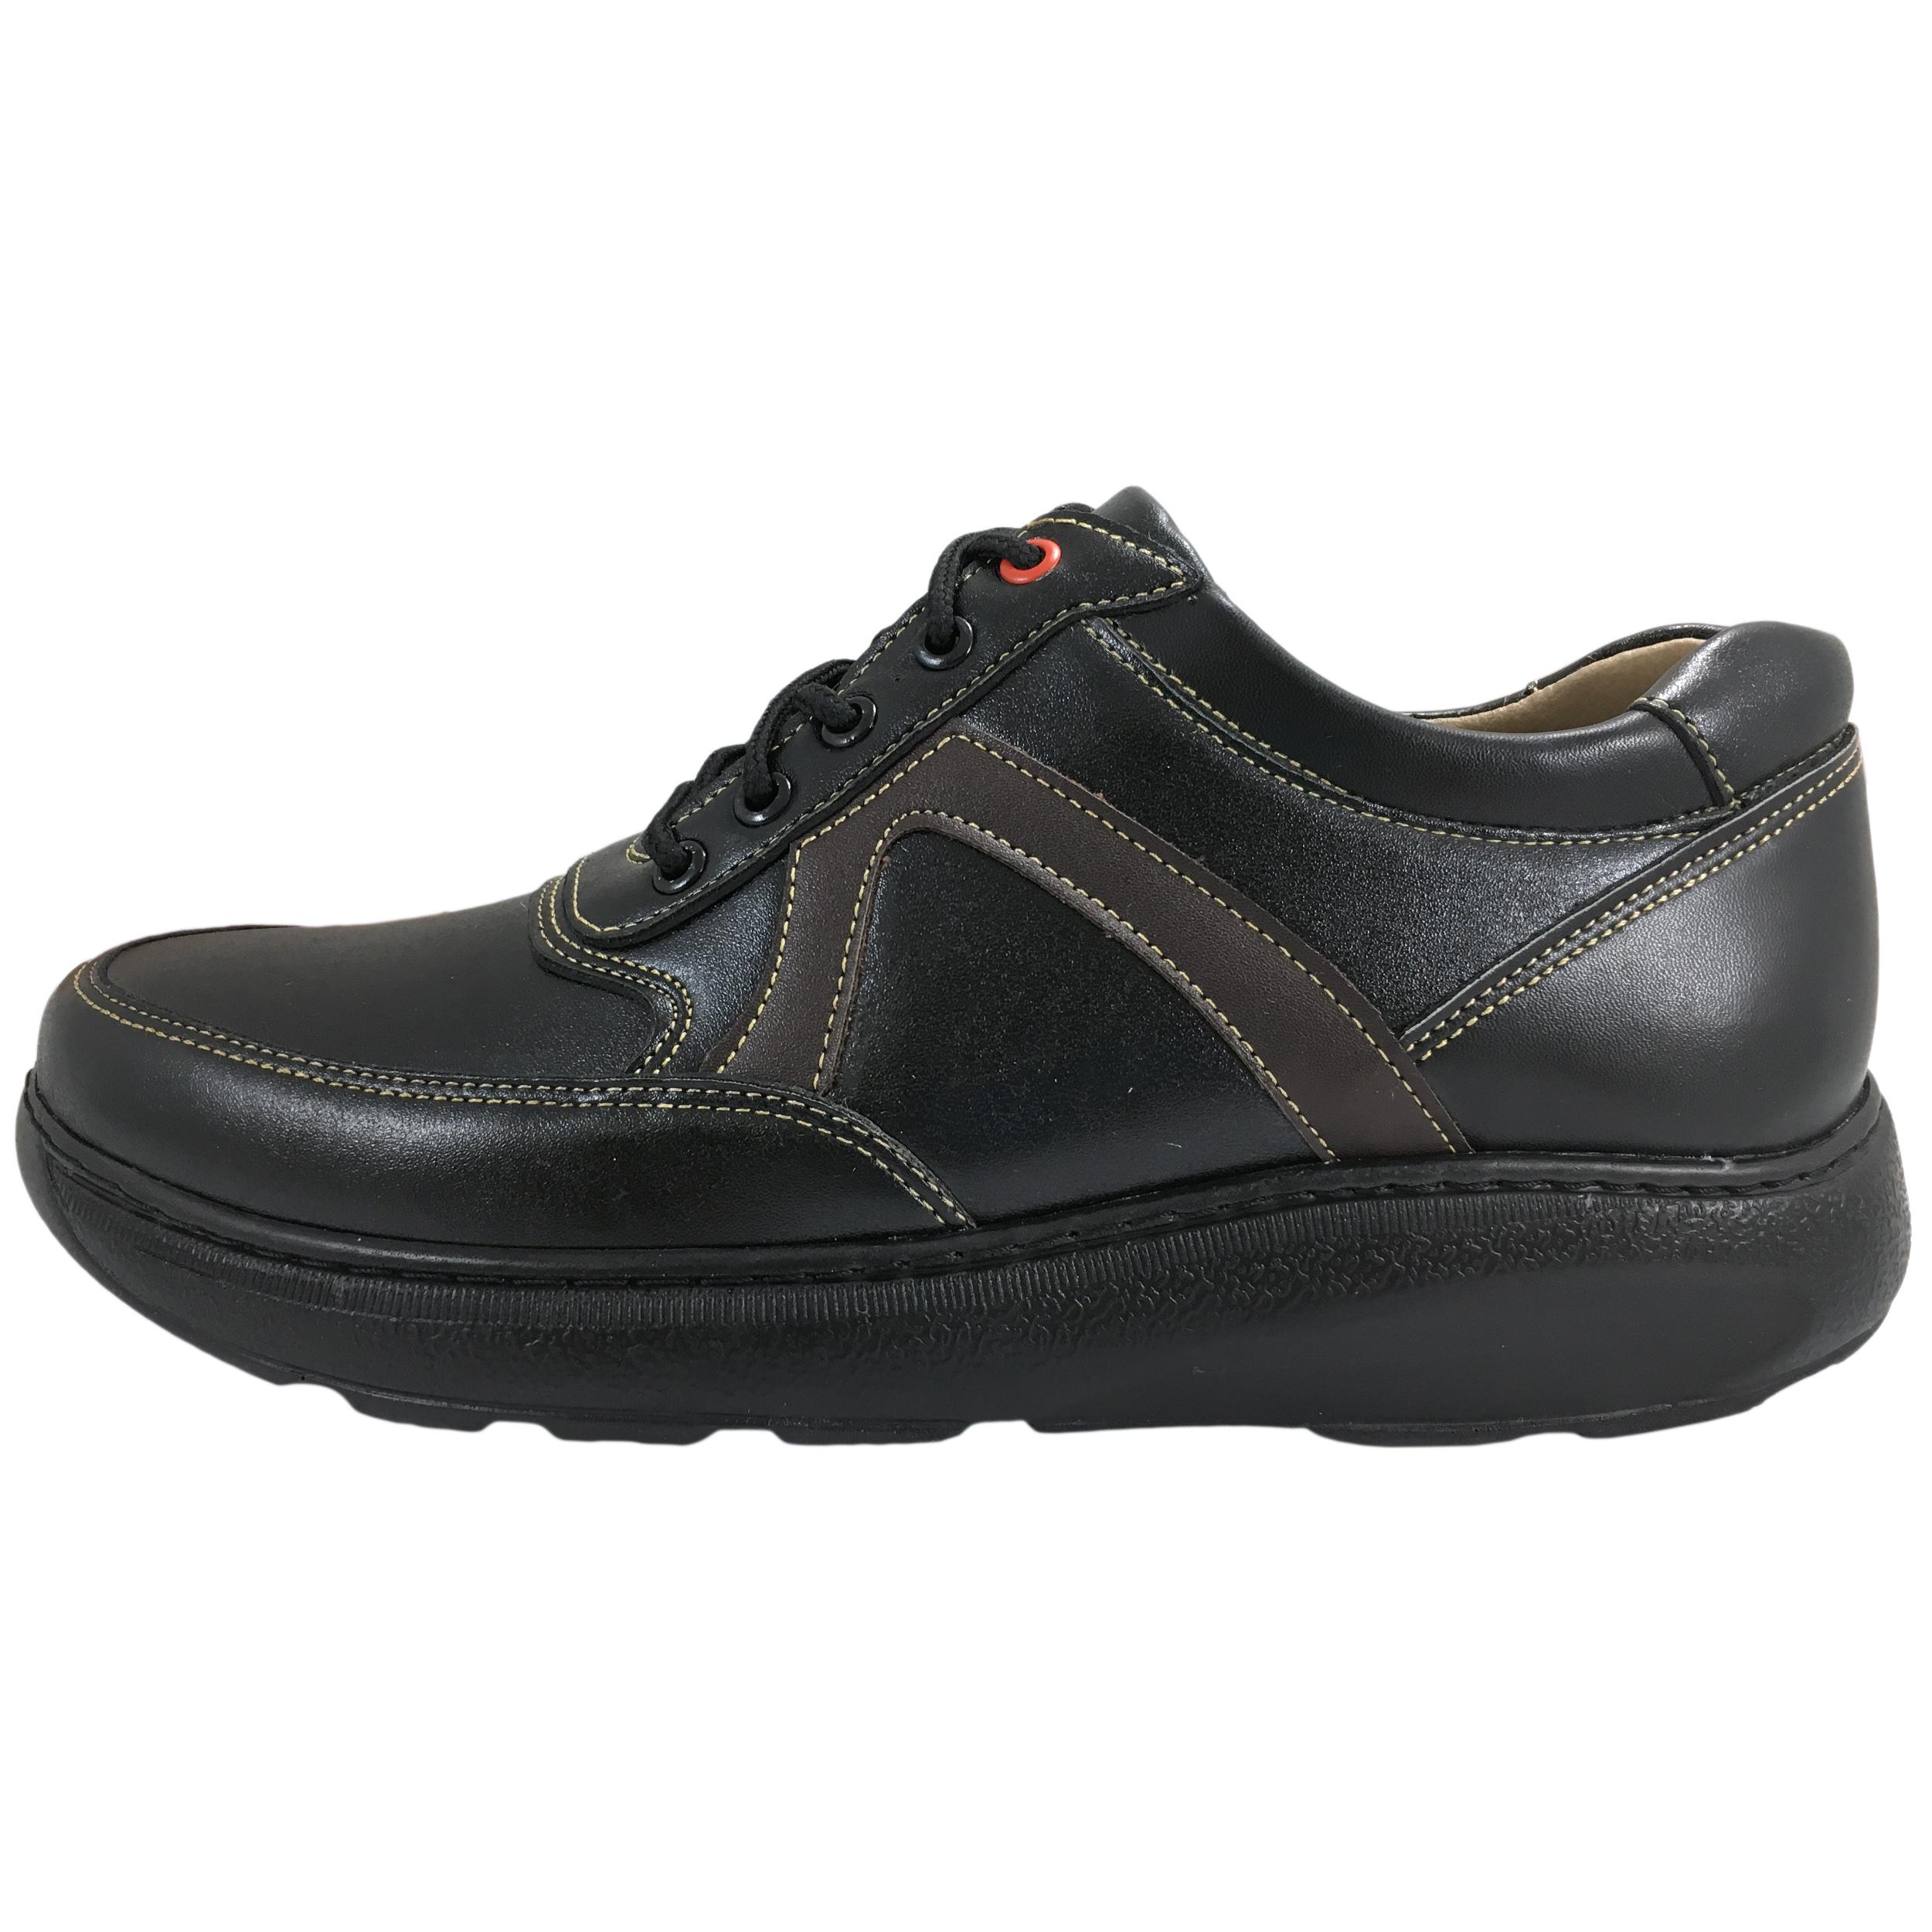 قیمت کفش مردانه مدل رویال کد A183